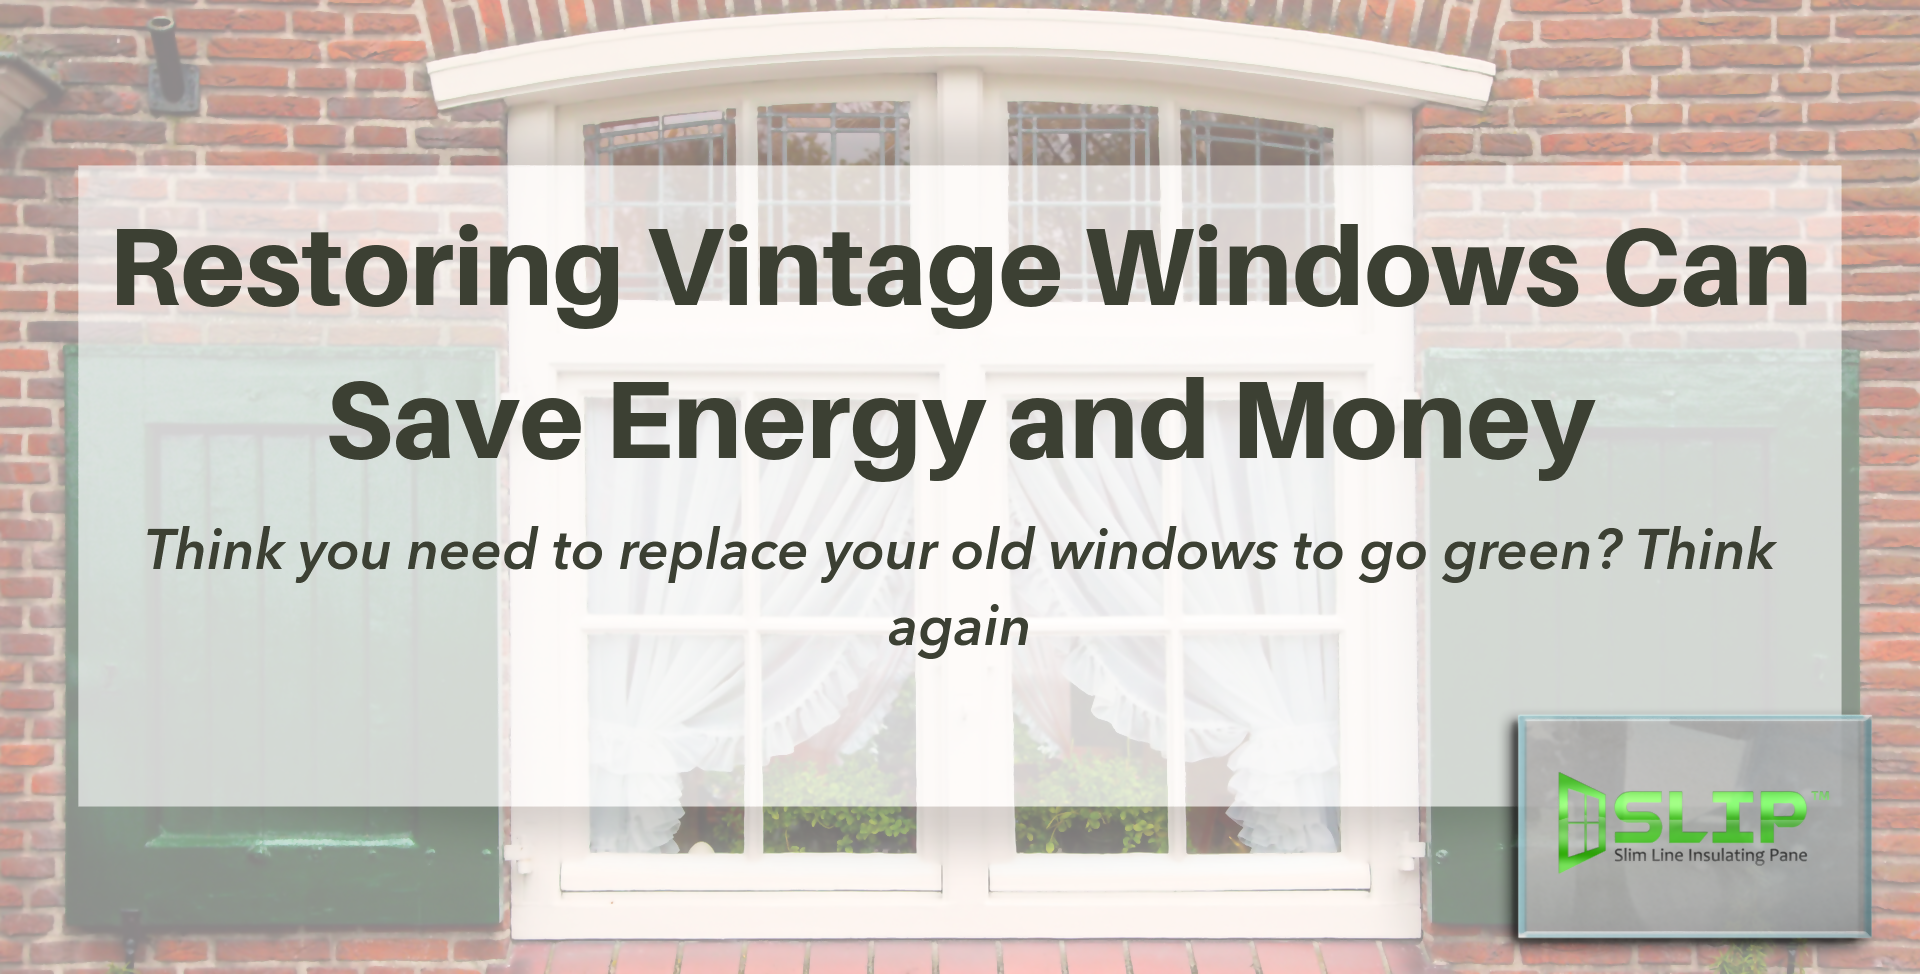 Go Green With Window Restoration